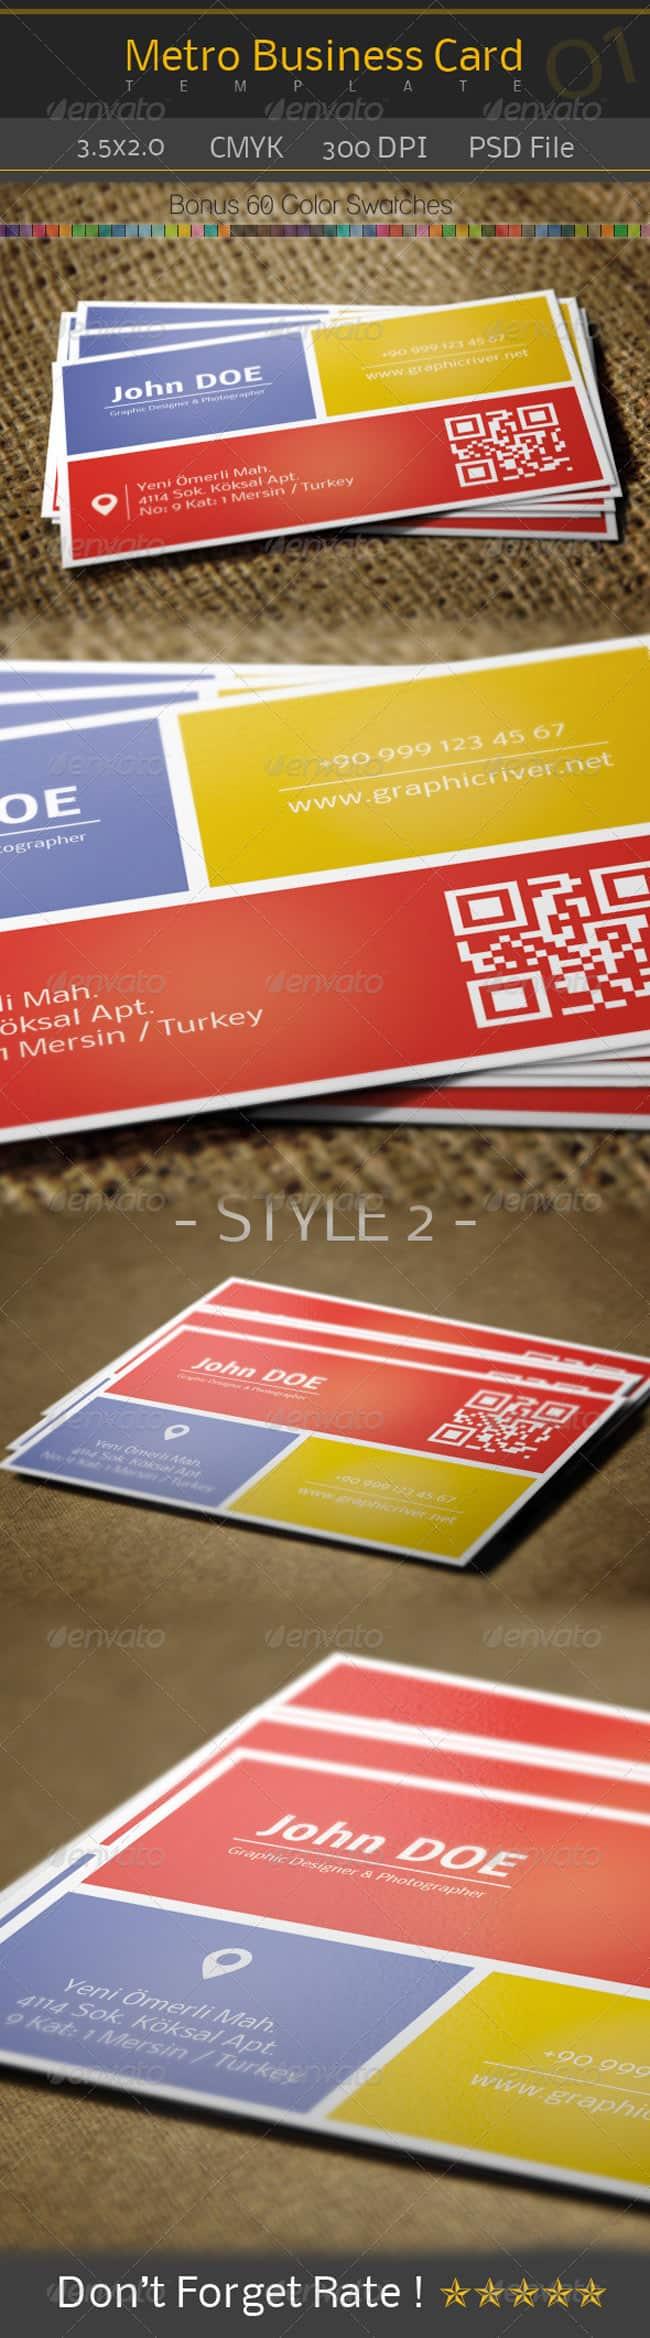 Metro Business Card - 01